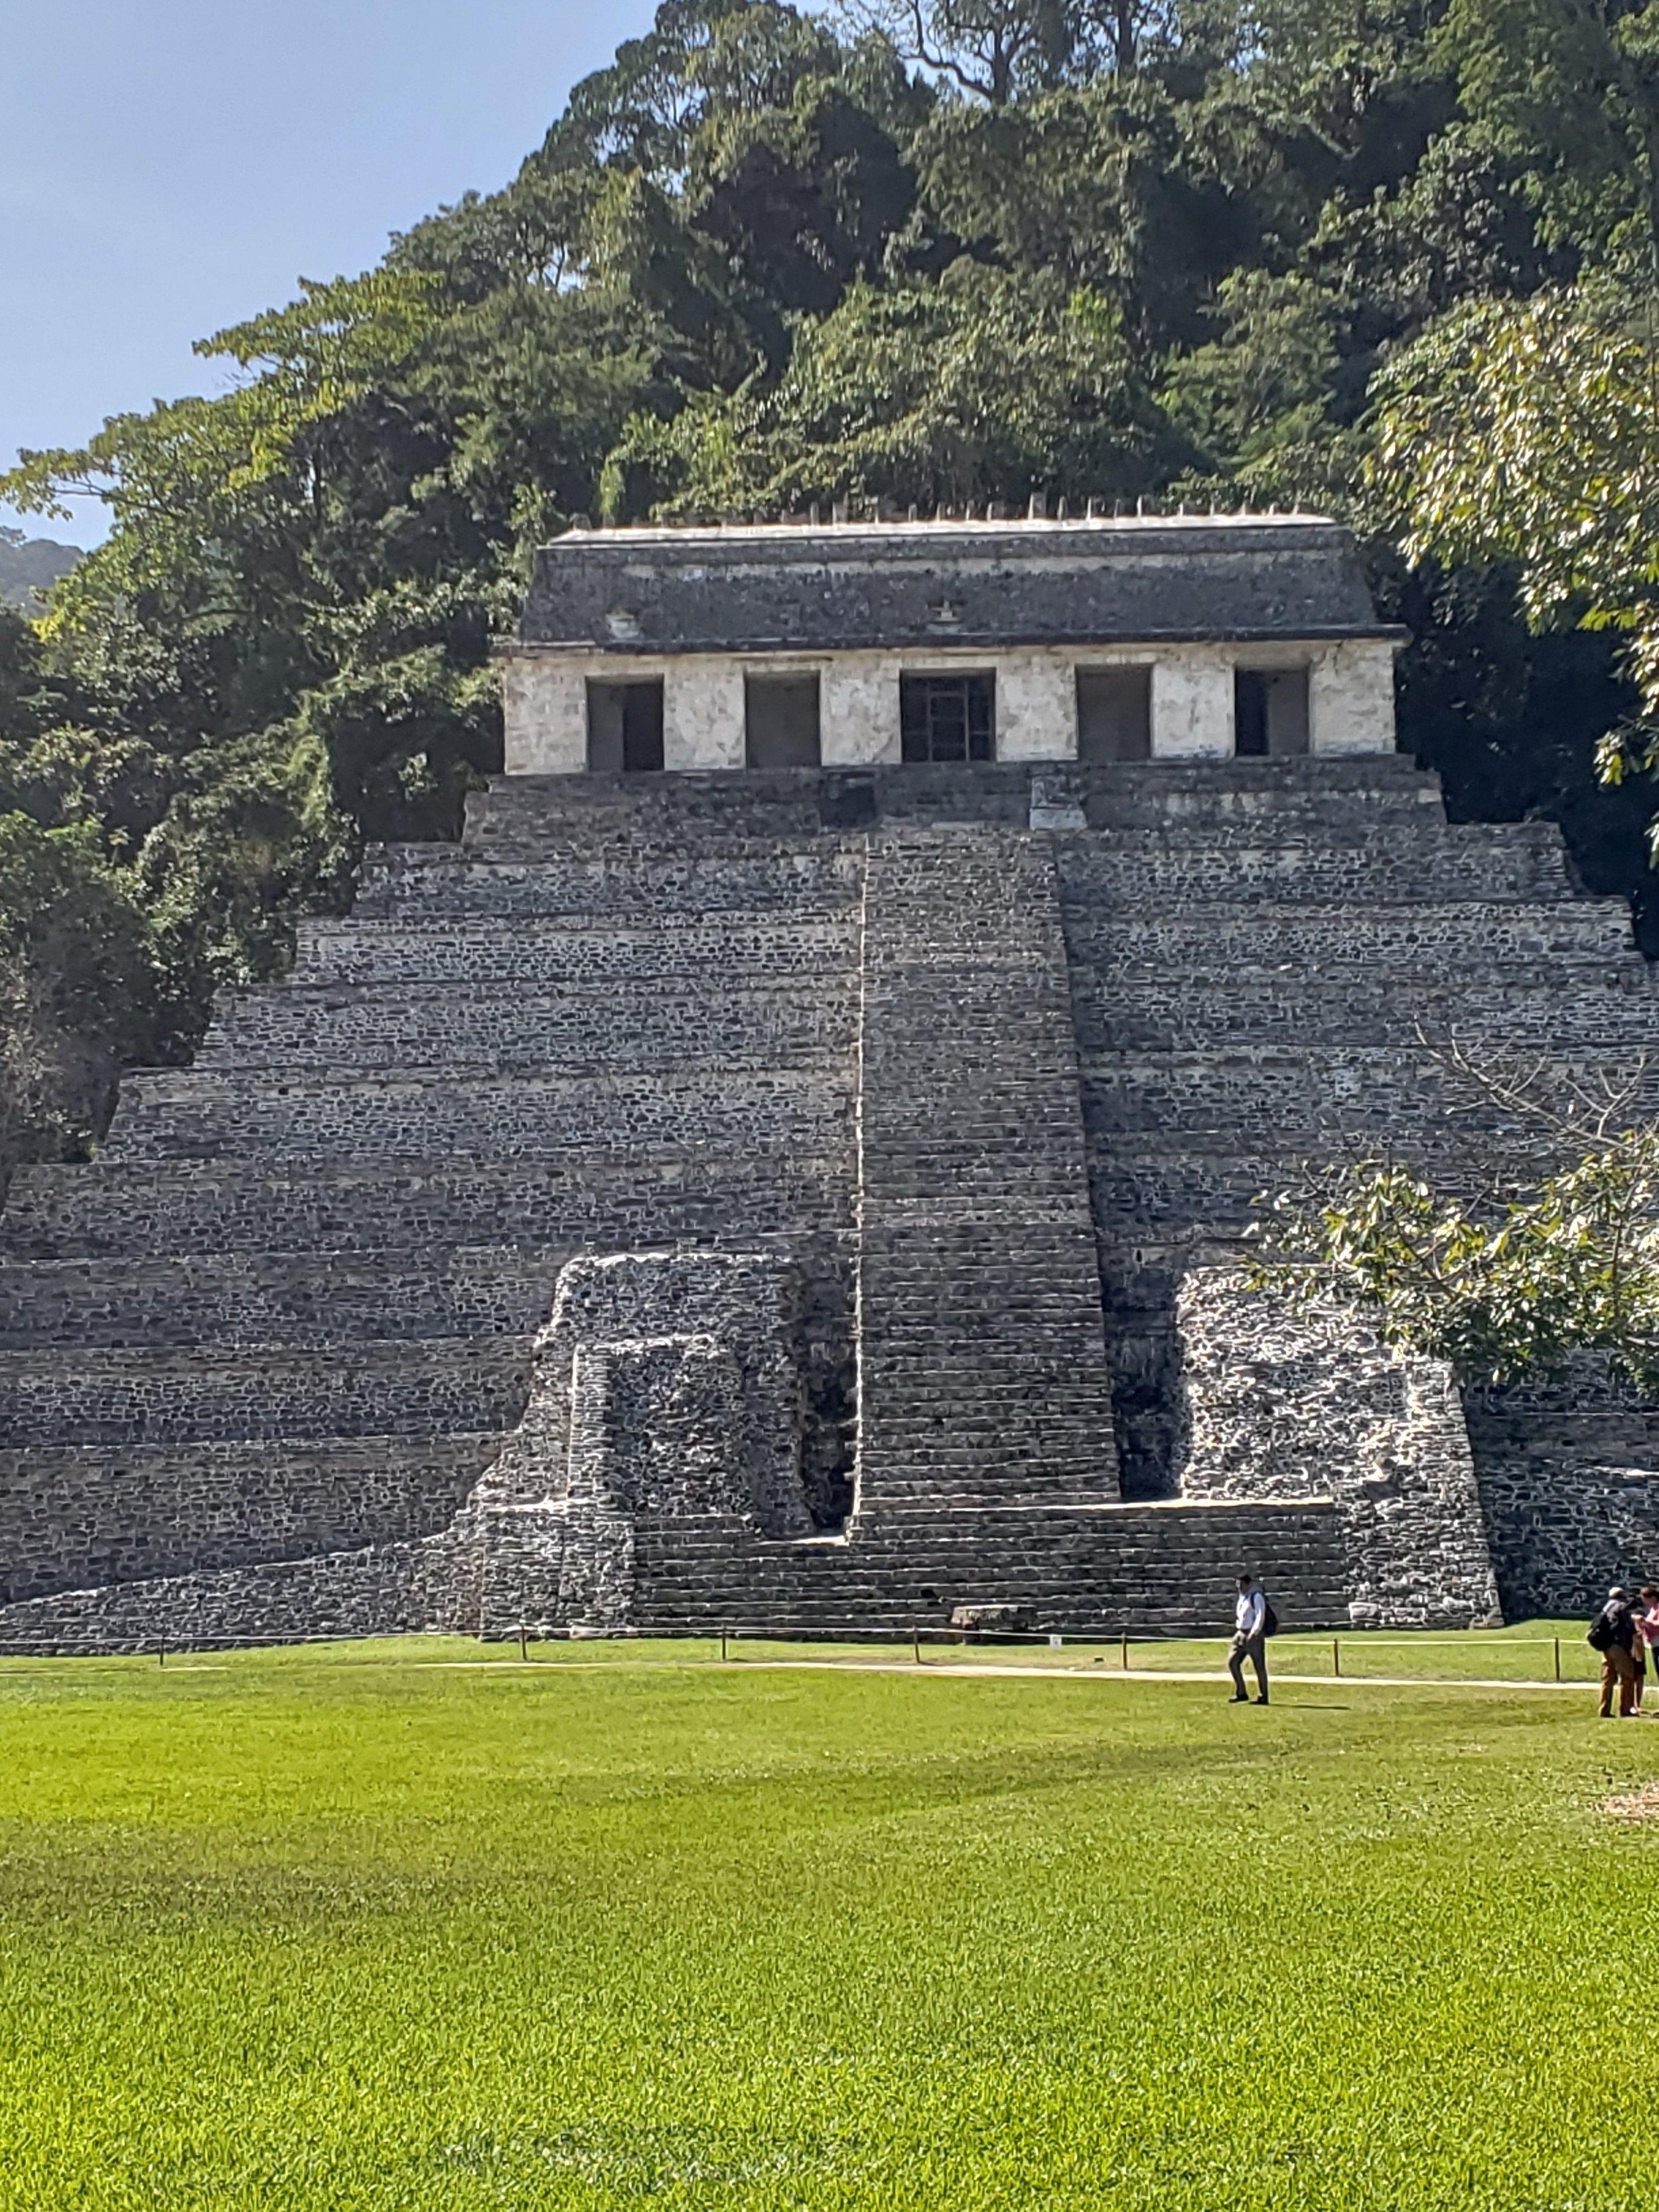 The famous Mayan ruins at Palenque